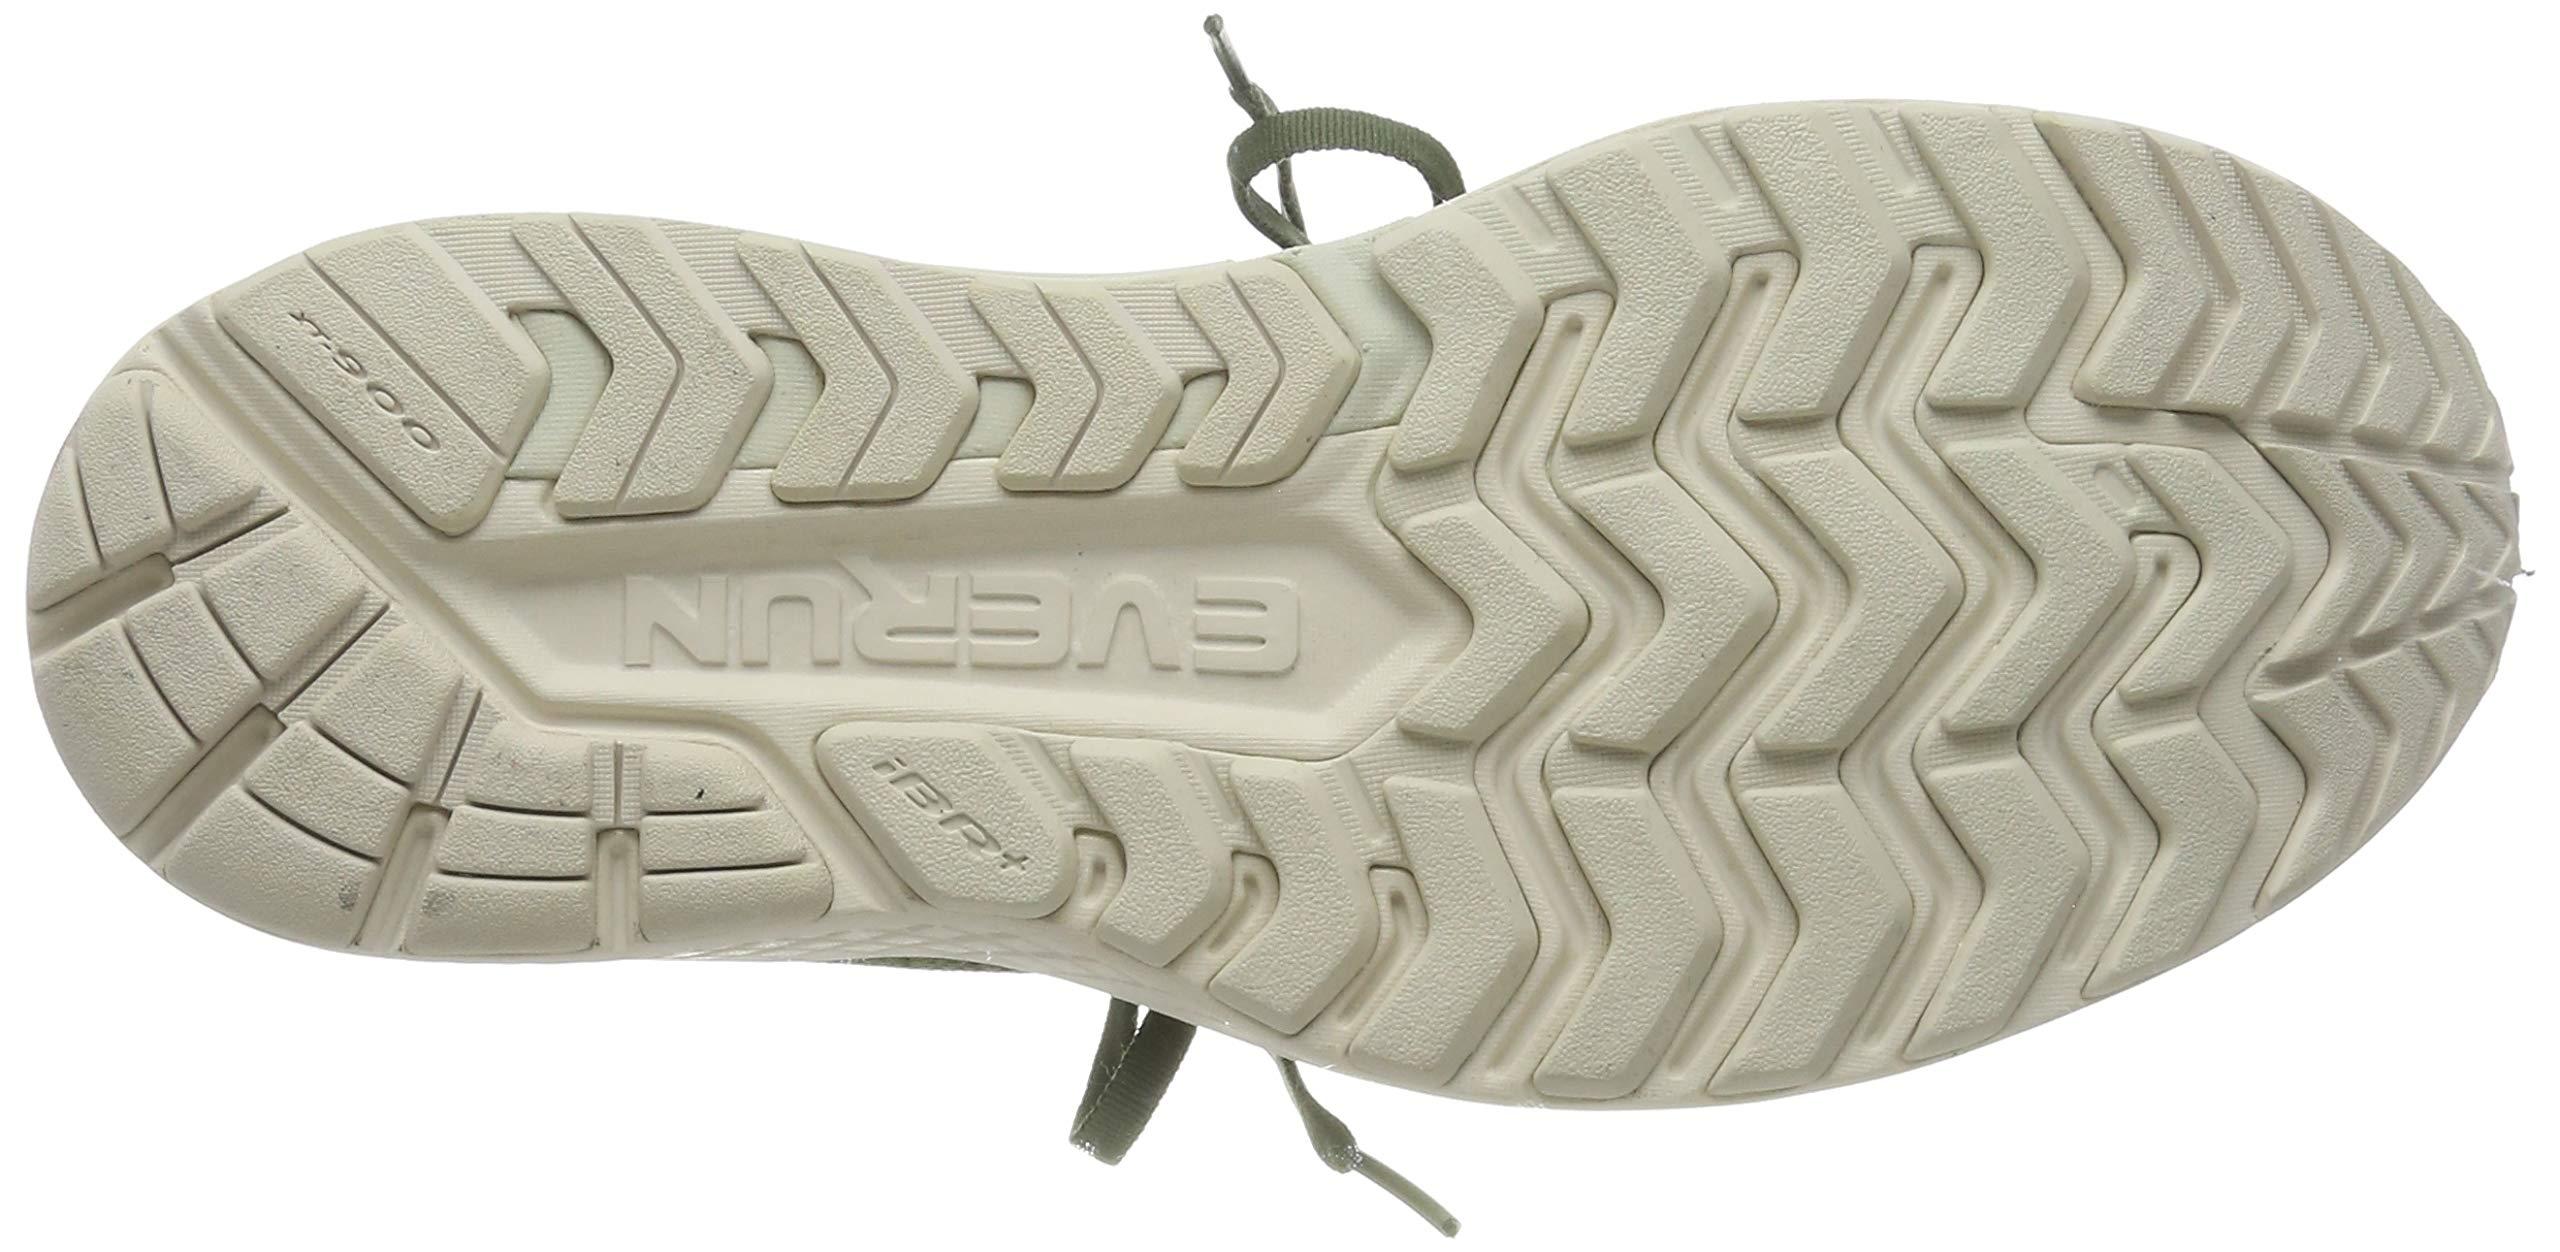 Saucony - Guide ISO 2, Scarpa da Corsa Uomo 3 spesavip